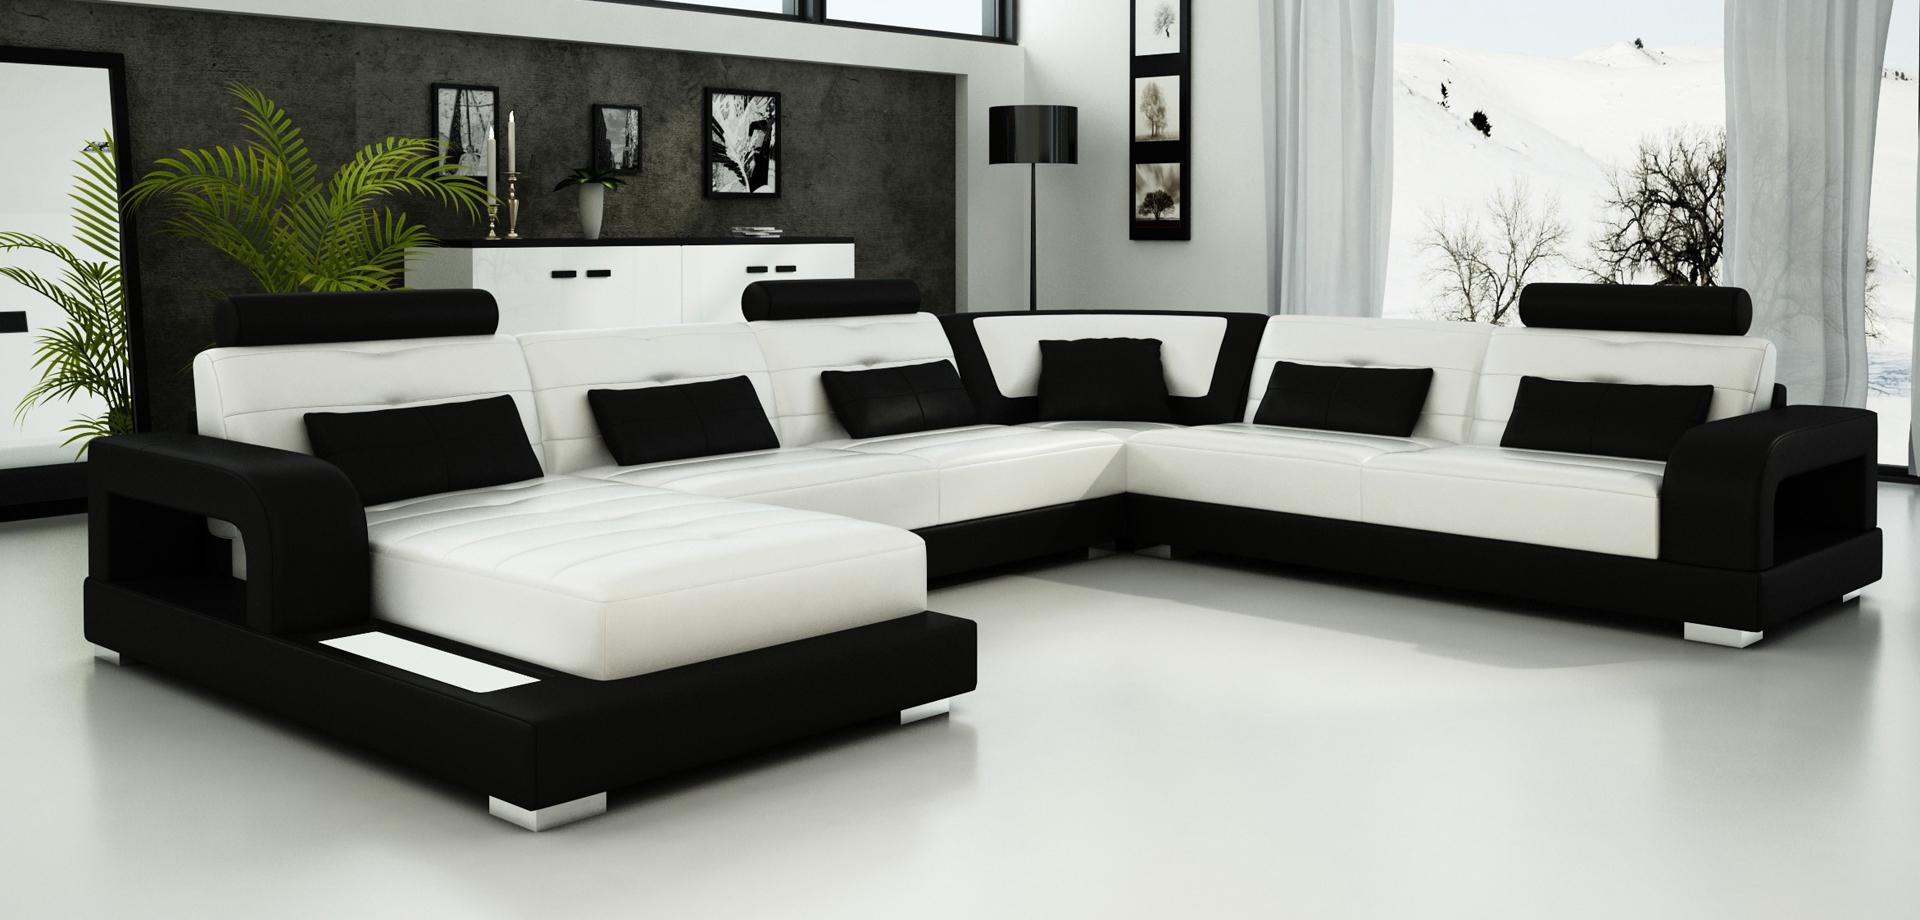 Furniture Manufacturers in Delhi, Royal Sofa Set, Wooden ...